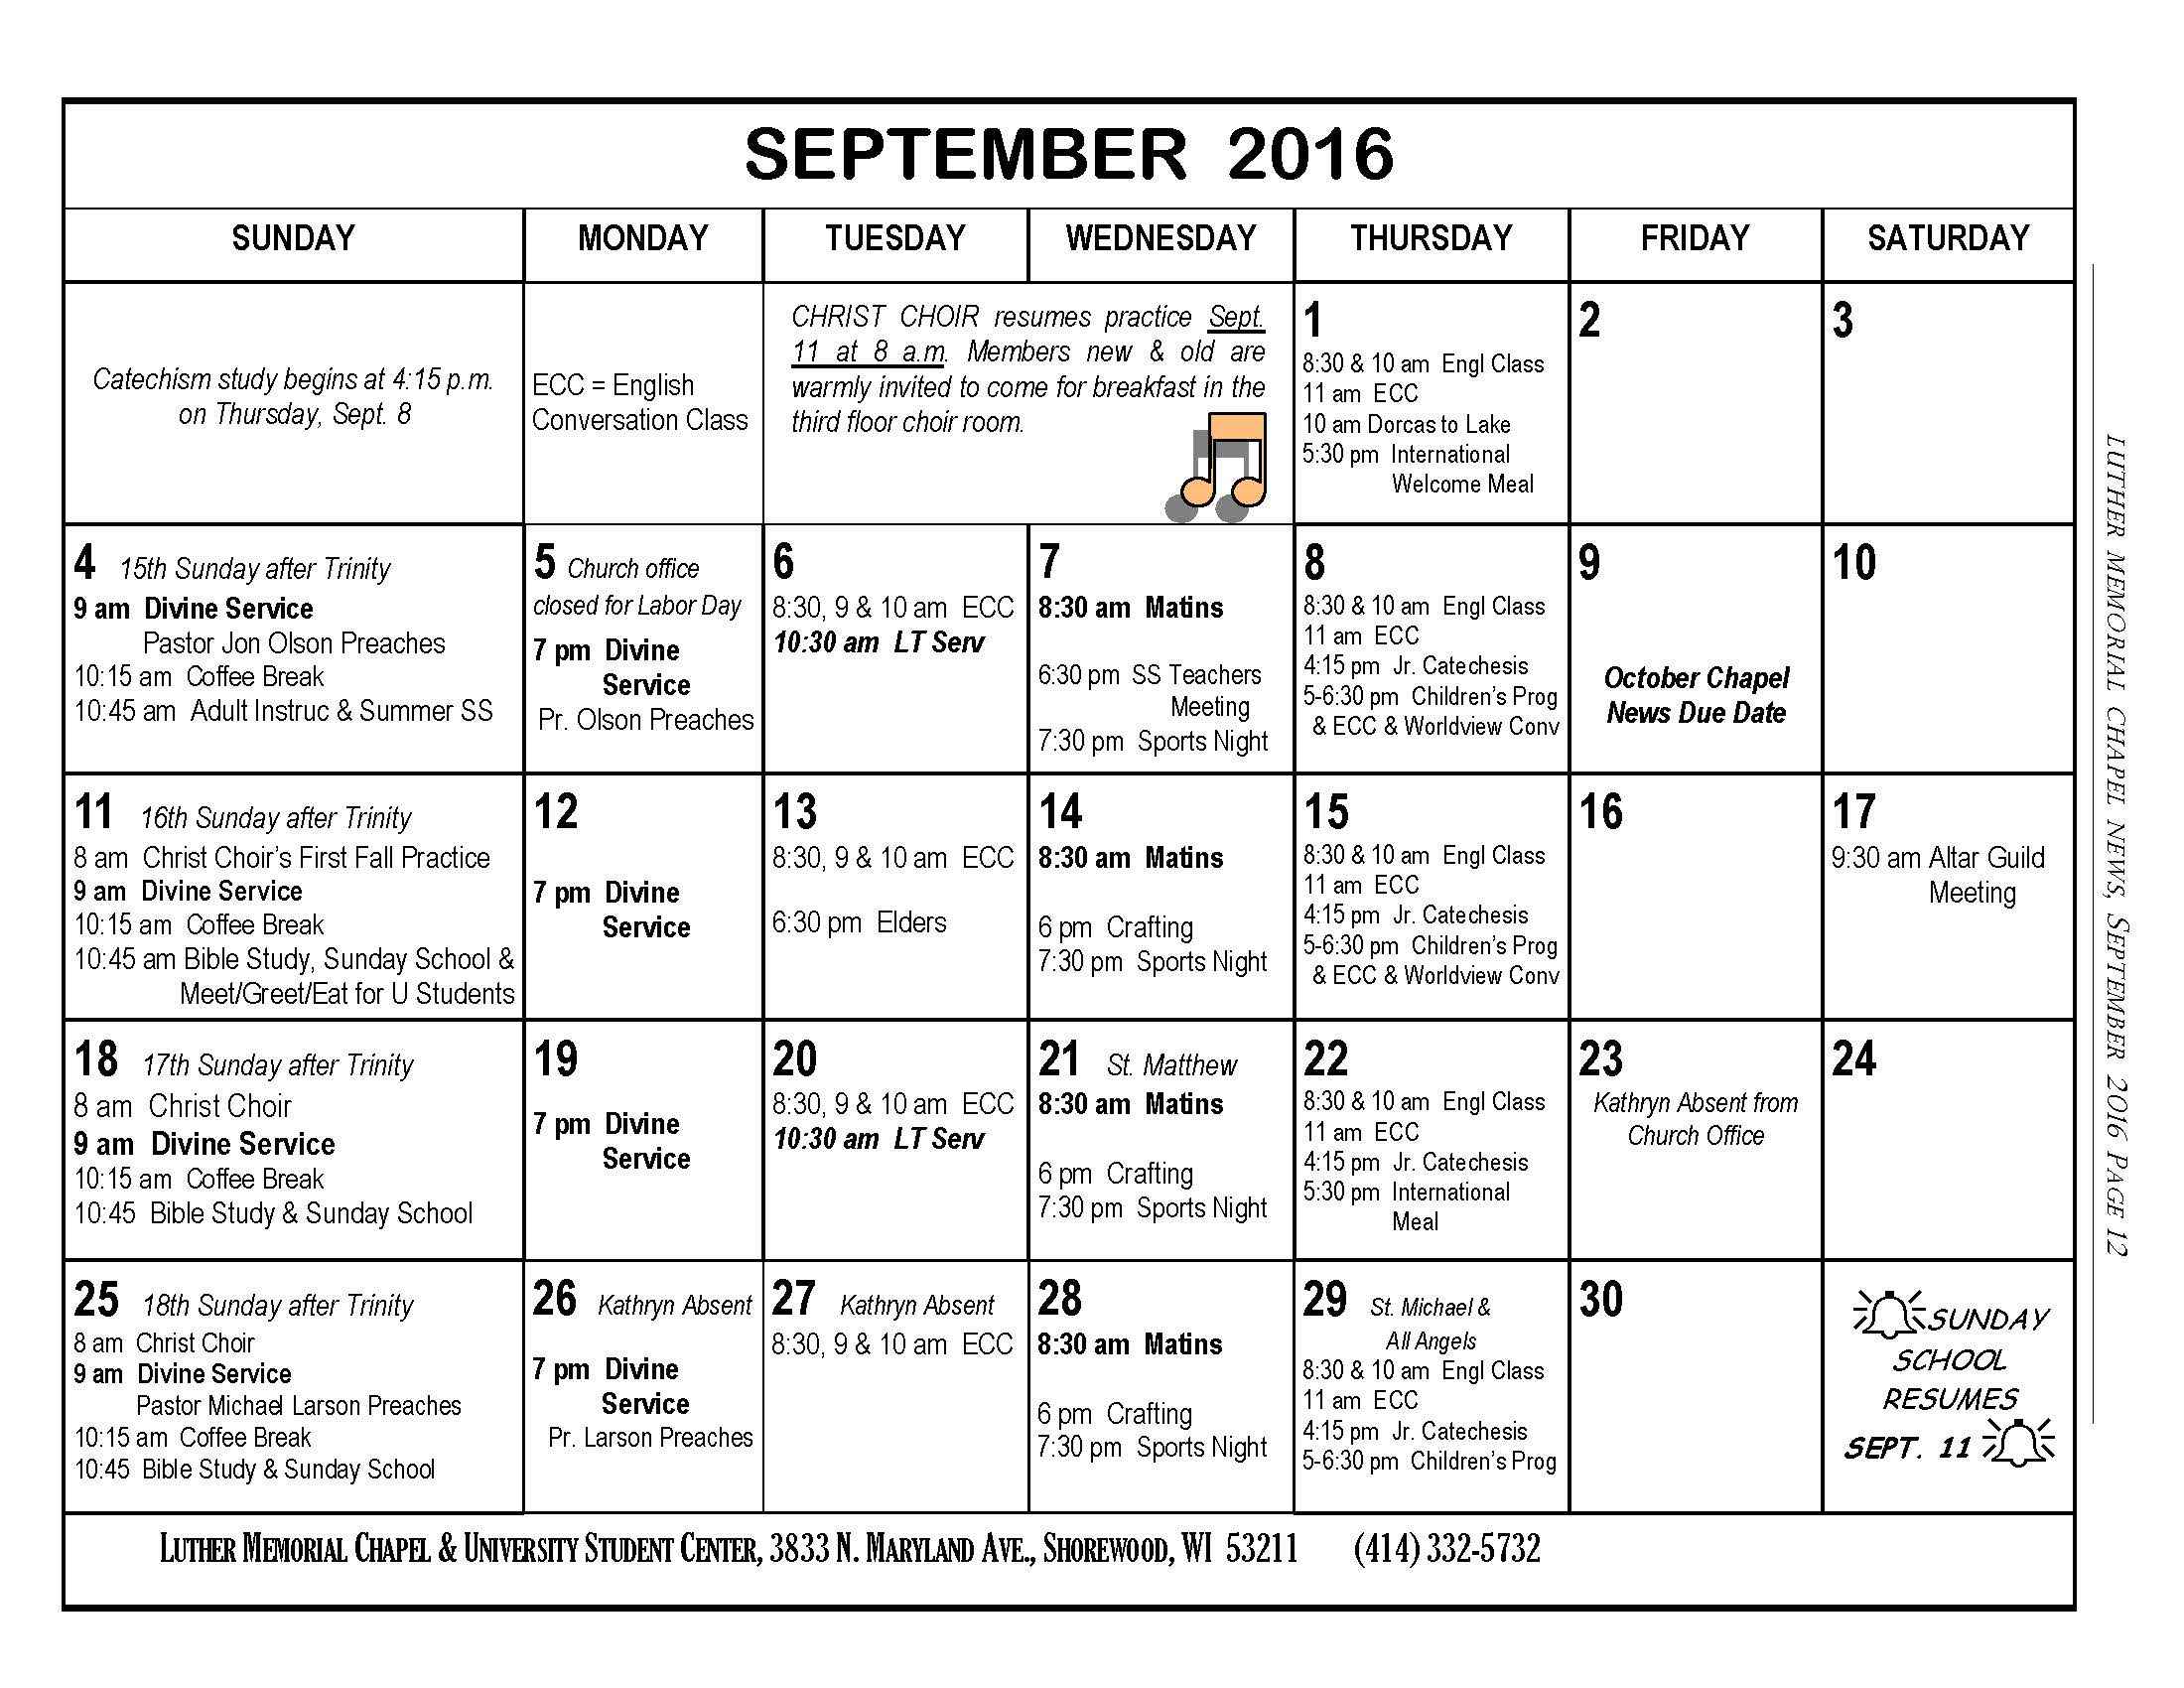 Ecc Calendar.Chapel News Calendar Luther Memorial Chapel And University